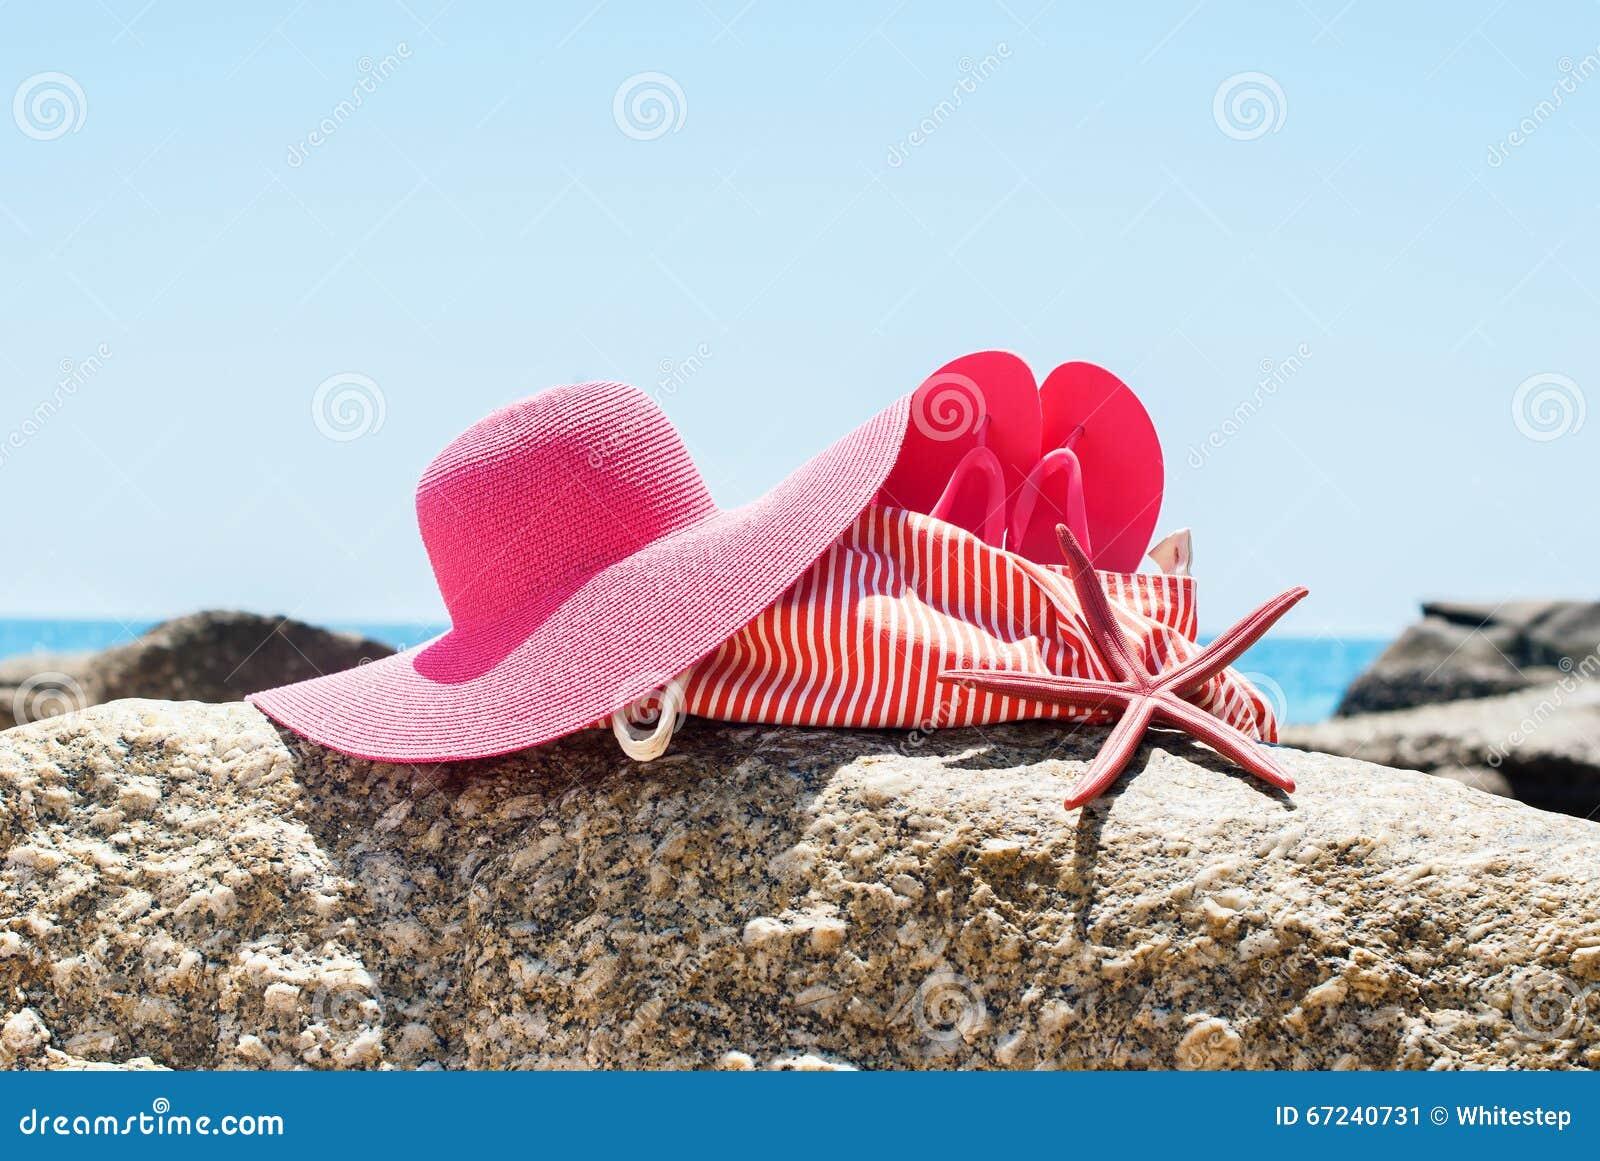 60e9755fb119c Beach Bag Flip Flops Sea Star Hat Stones Overlooking Ocean Summer Holiday  Concept